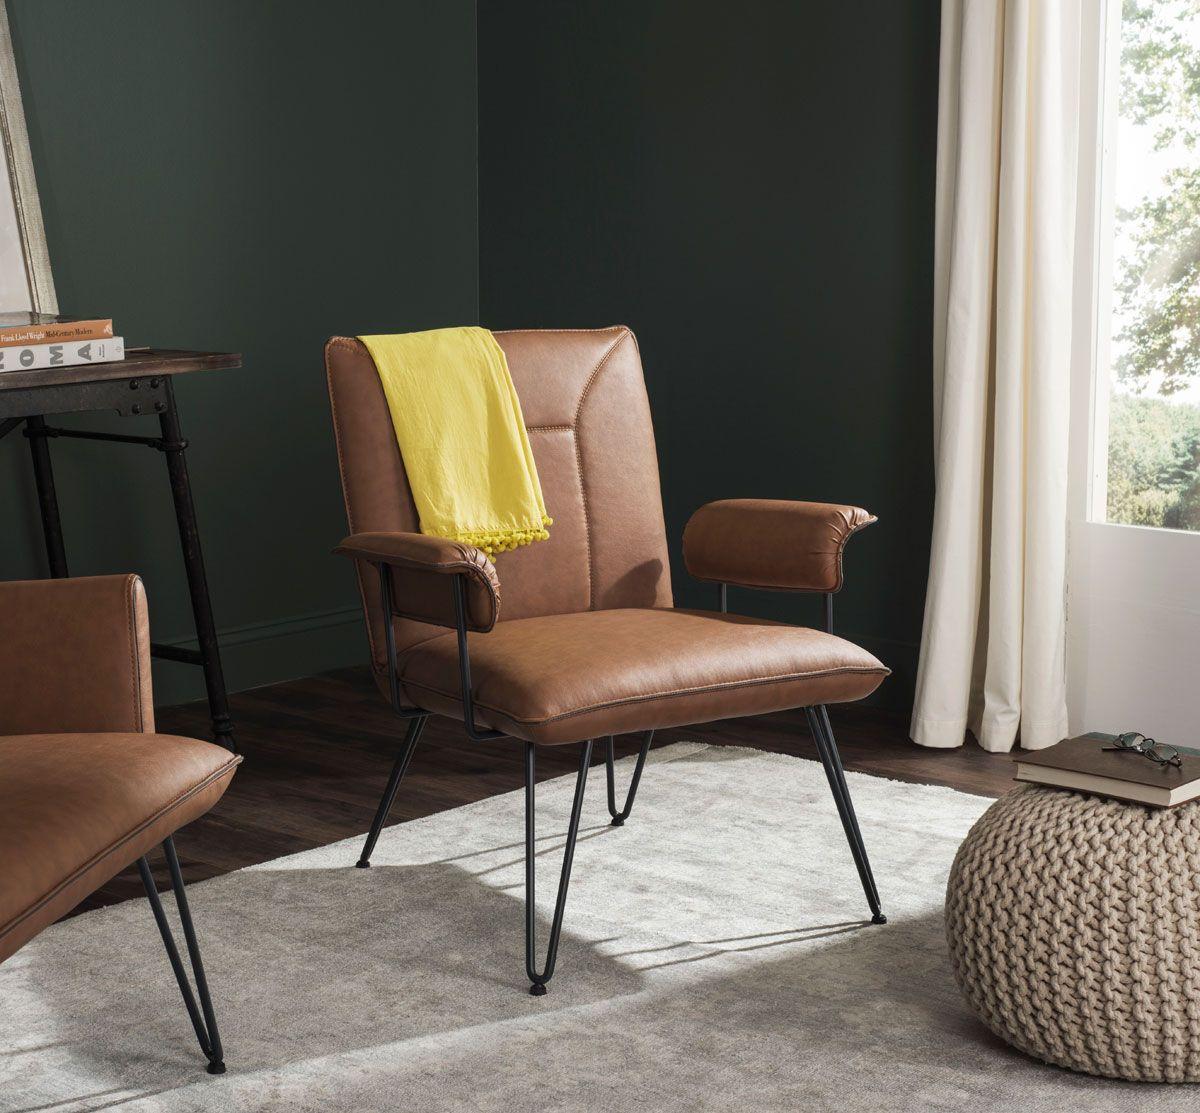 Safvaieh S Johannes Retro Mid Century Leather Arm Chair Sku Fox1700c Color Camel